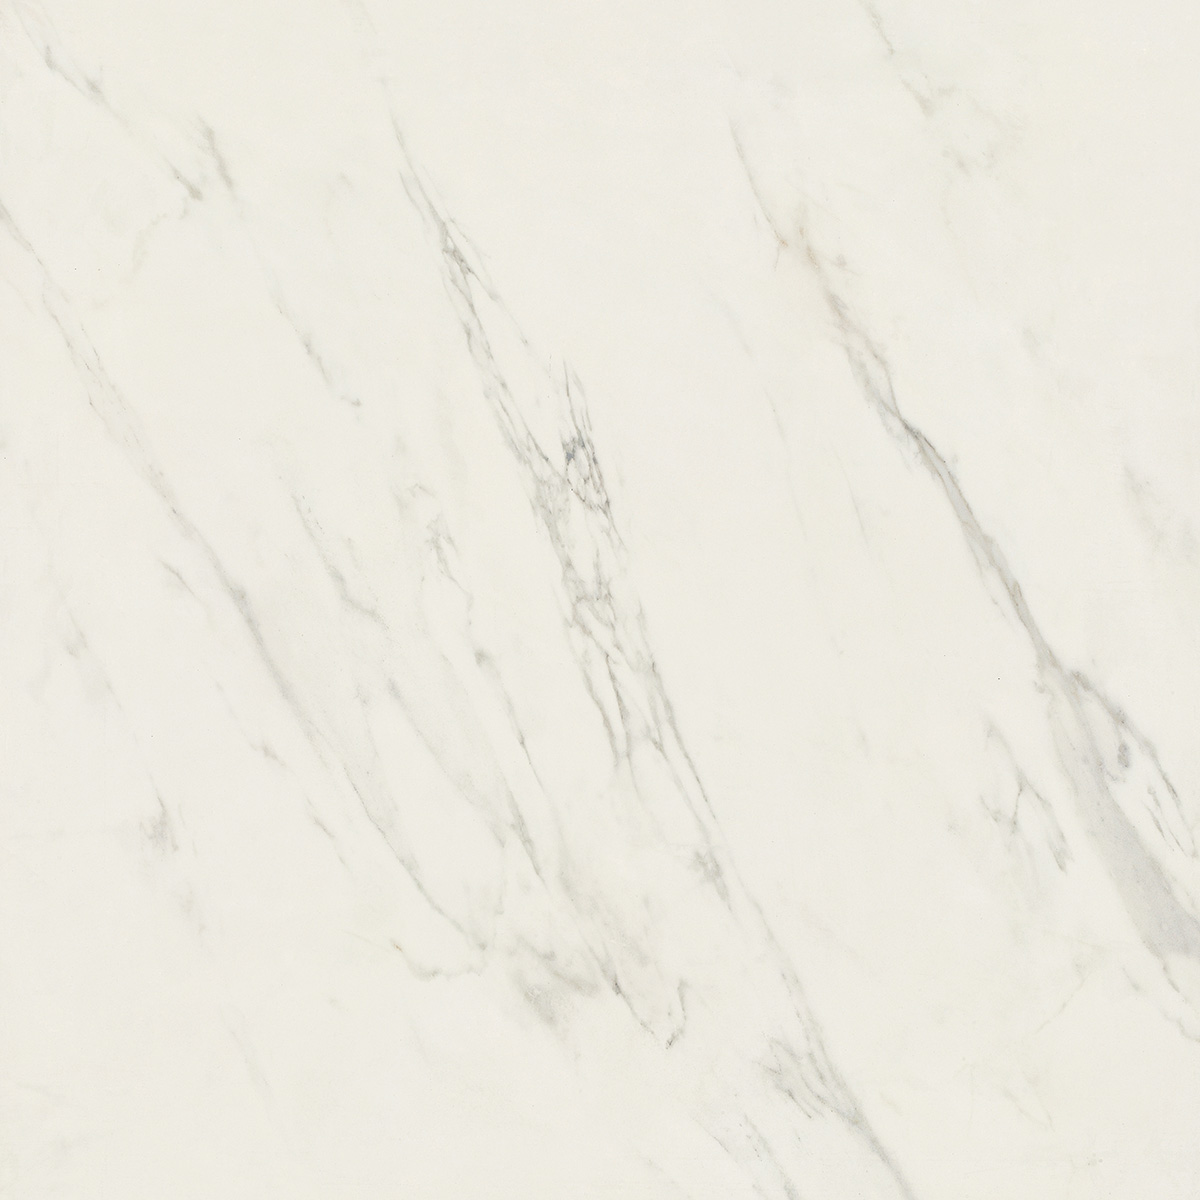 鱼肚白HPAC280701(800x800mm)